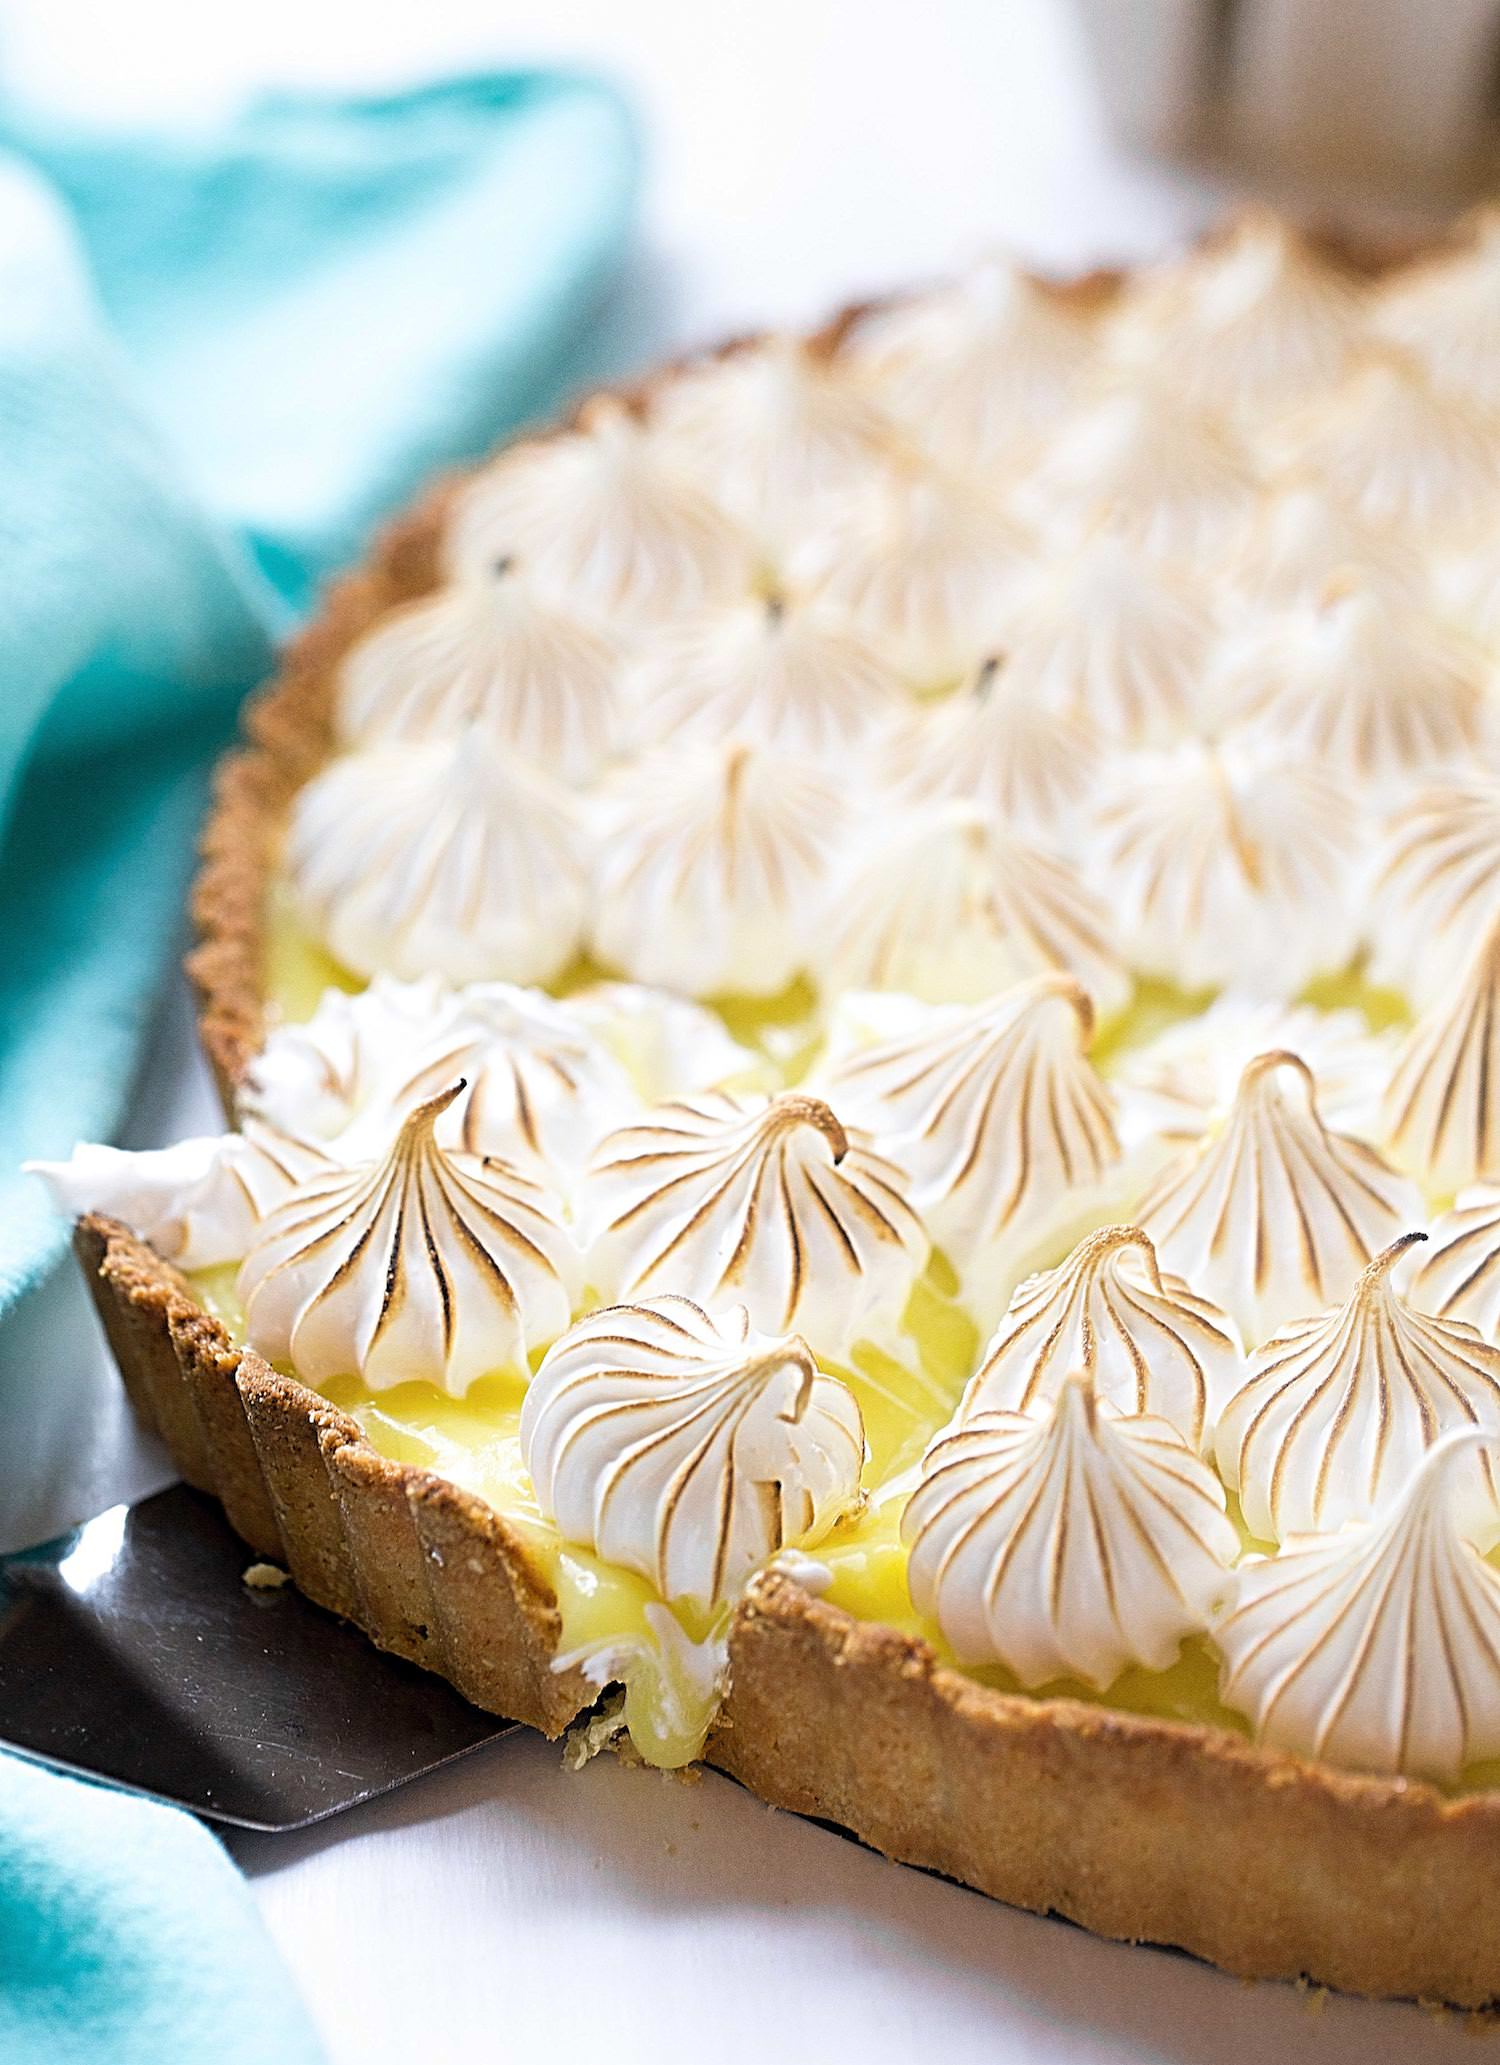 Passover Lemon Meringue Pie (Gluten-Free): tasty almond flour crust, tart and creamy lemon filling, and sweet, marshmallow-like meringue topping. | TrufflesandTrends.com